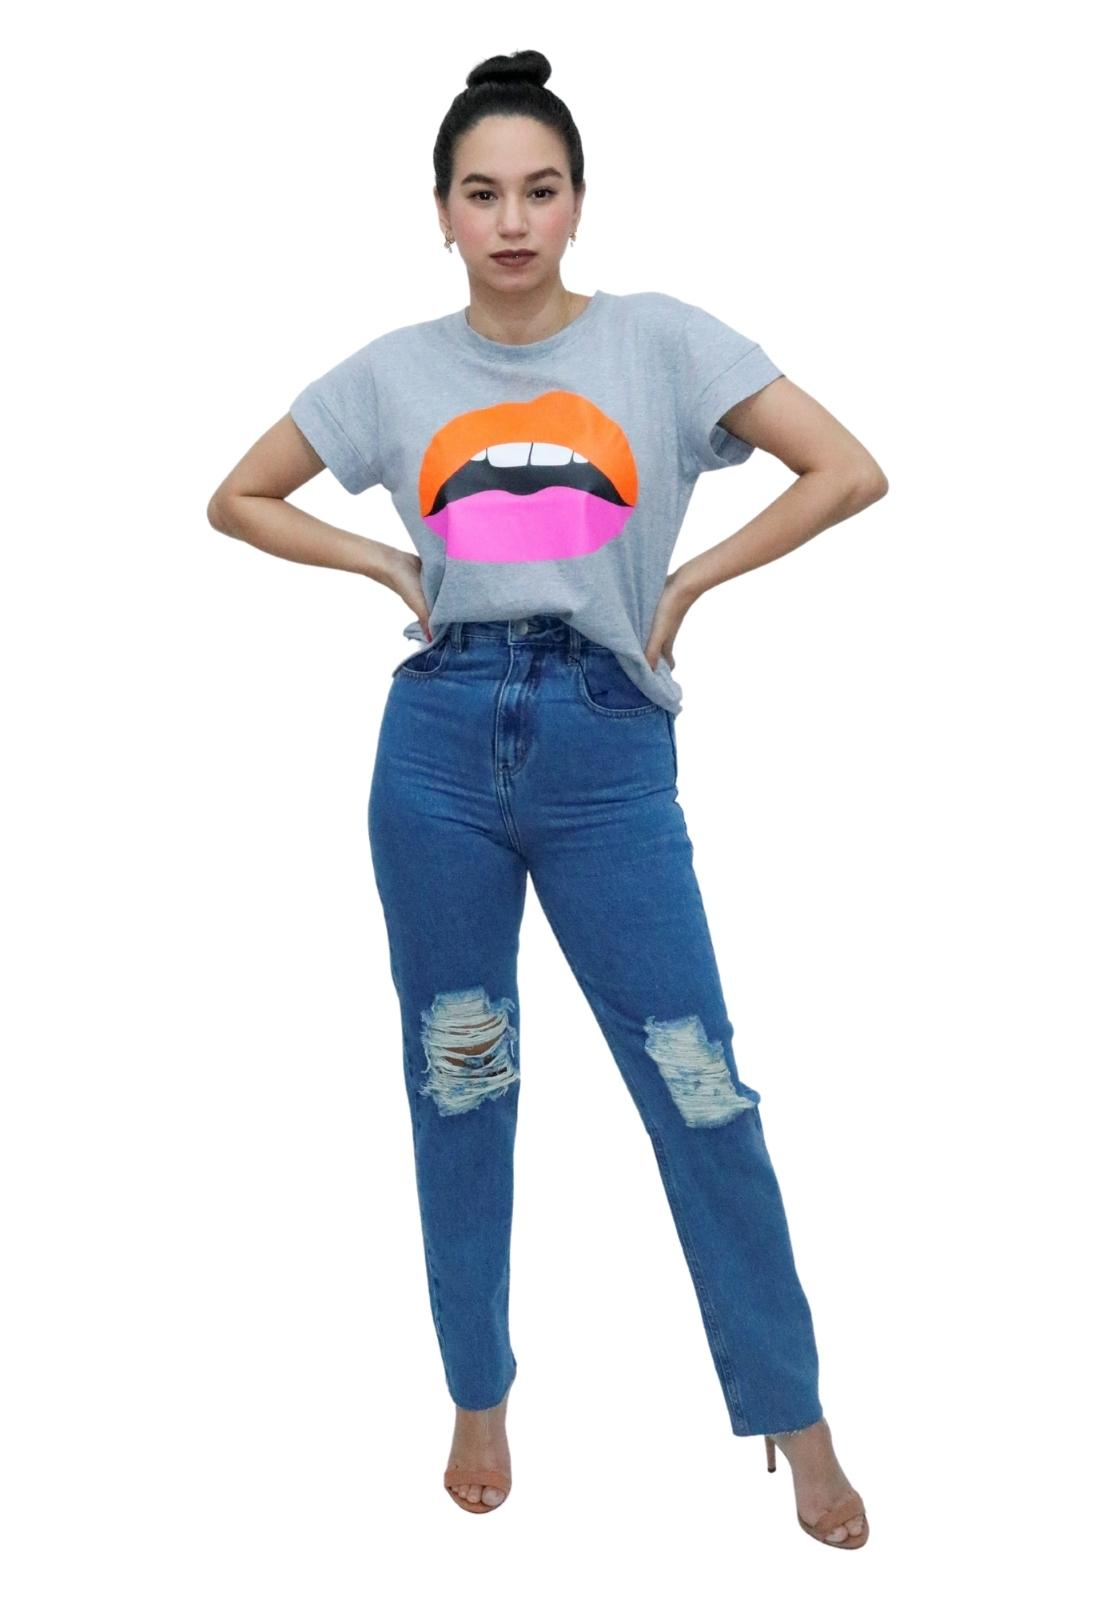 Calça Jeans Feminina Reta Cintura Alta Destroyed Puídos